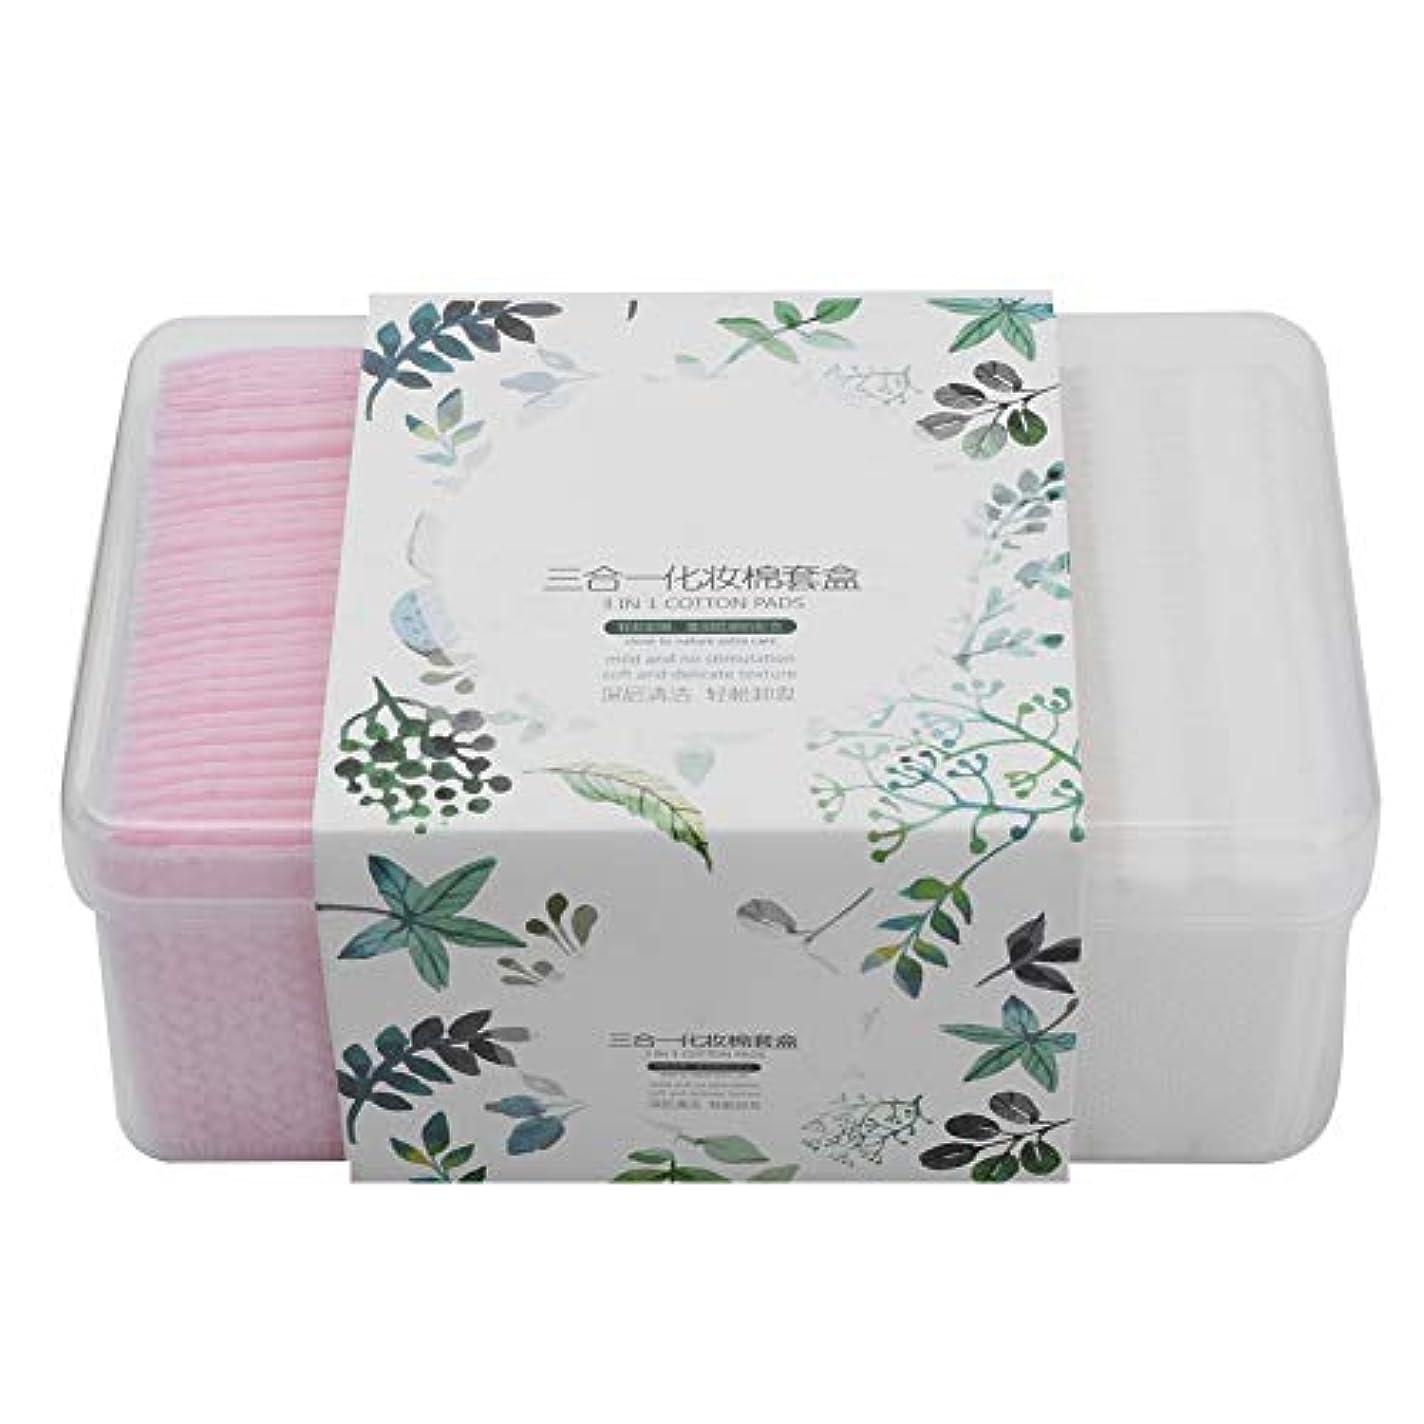 280Pcs /箱の構造の綿パッド、スキンケアの構造の除去剤のための顔の清潔になる綿および他の事は拭きます